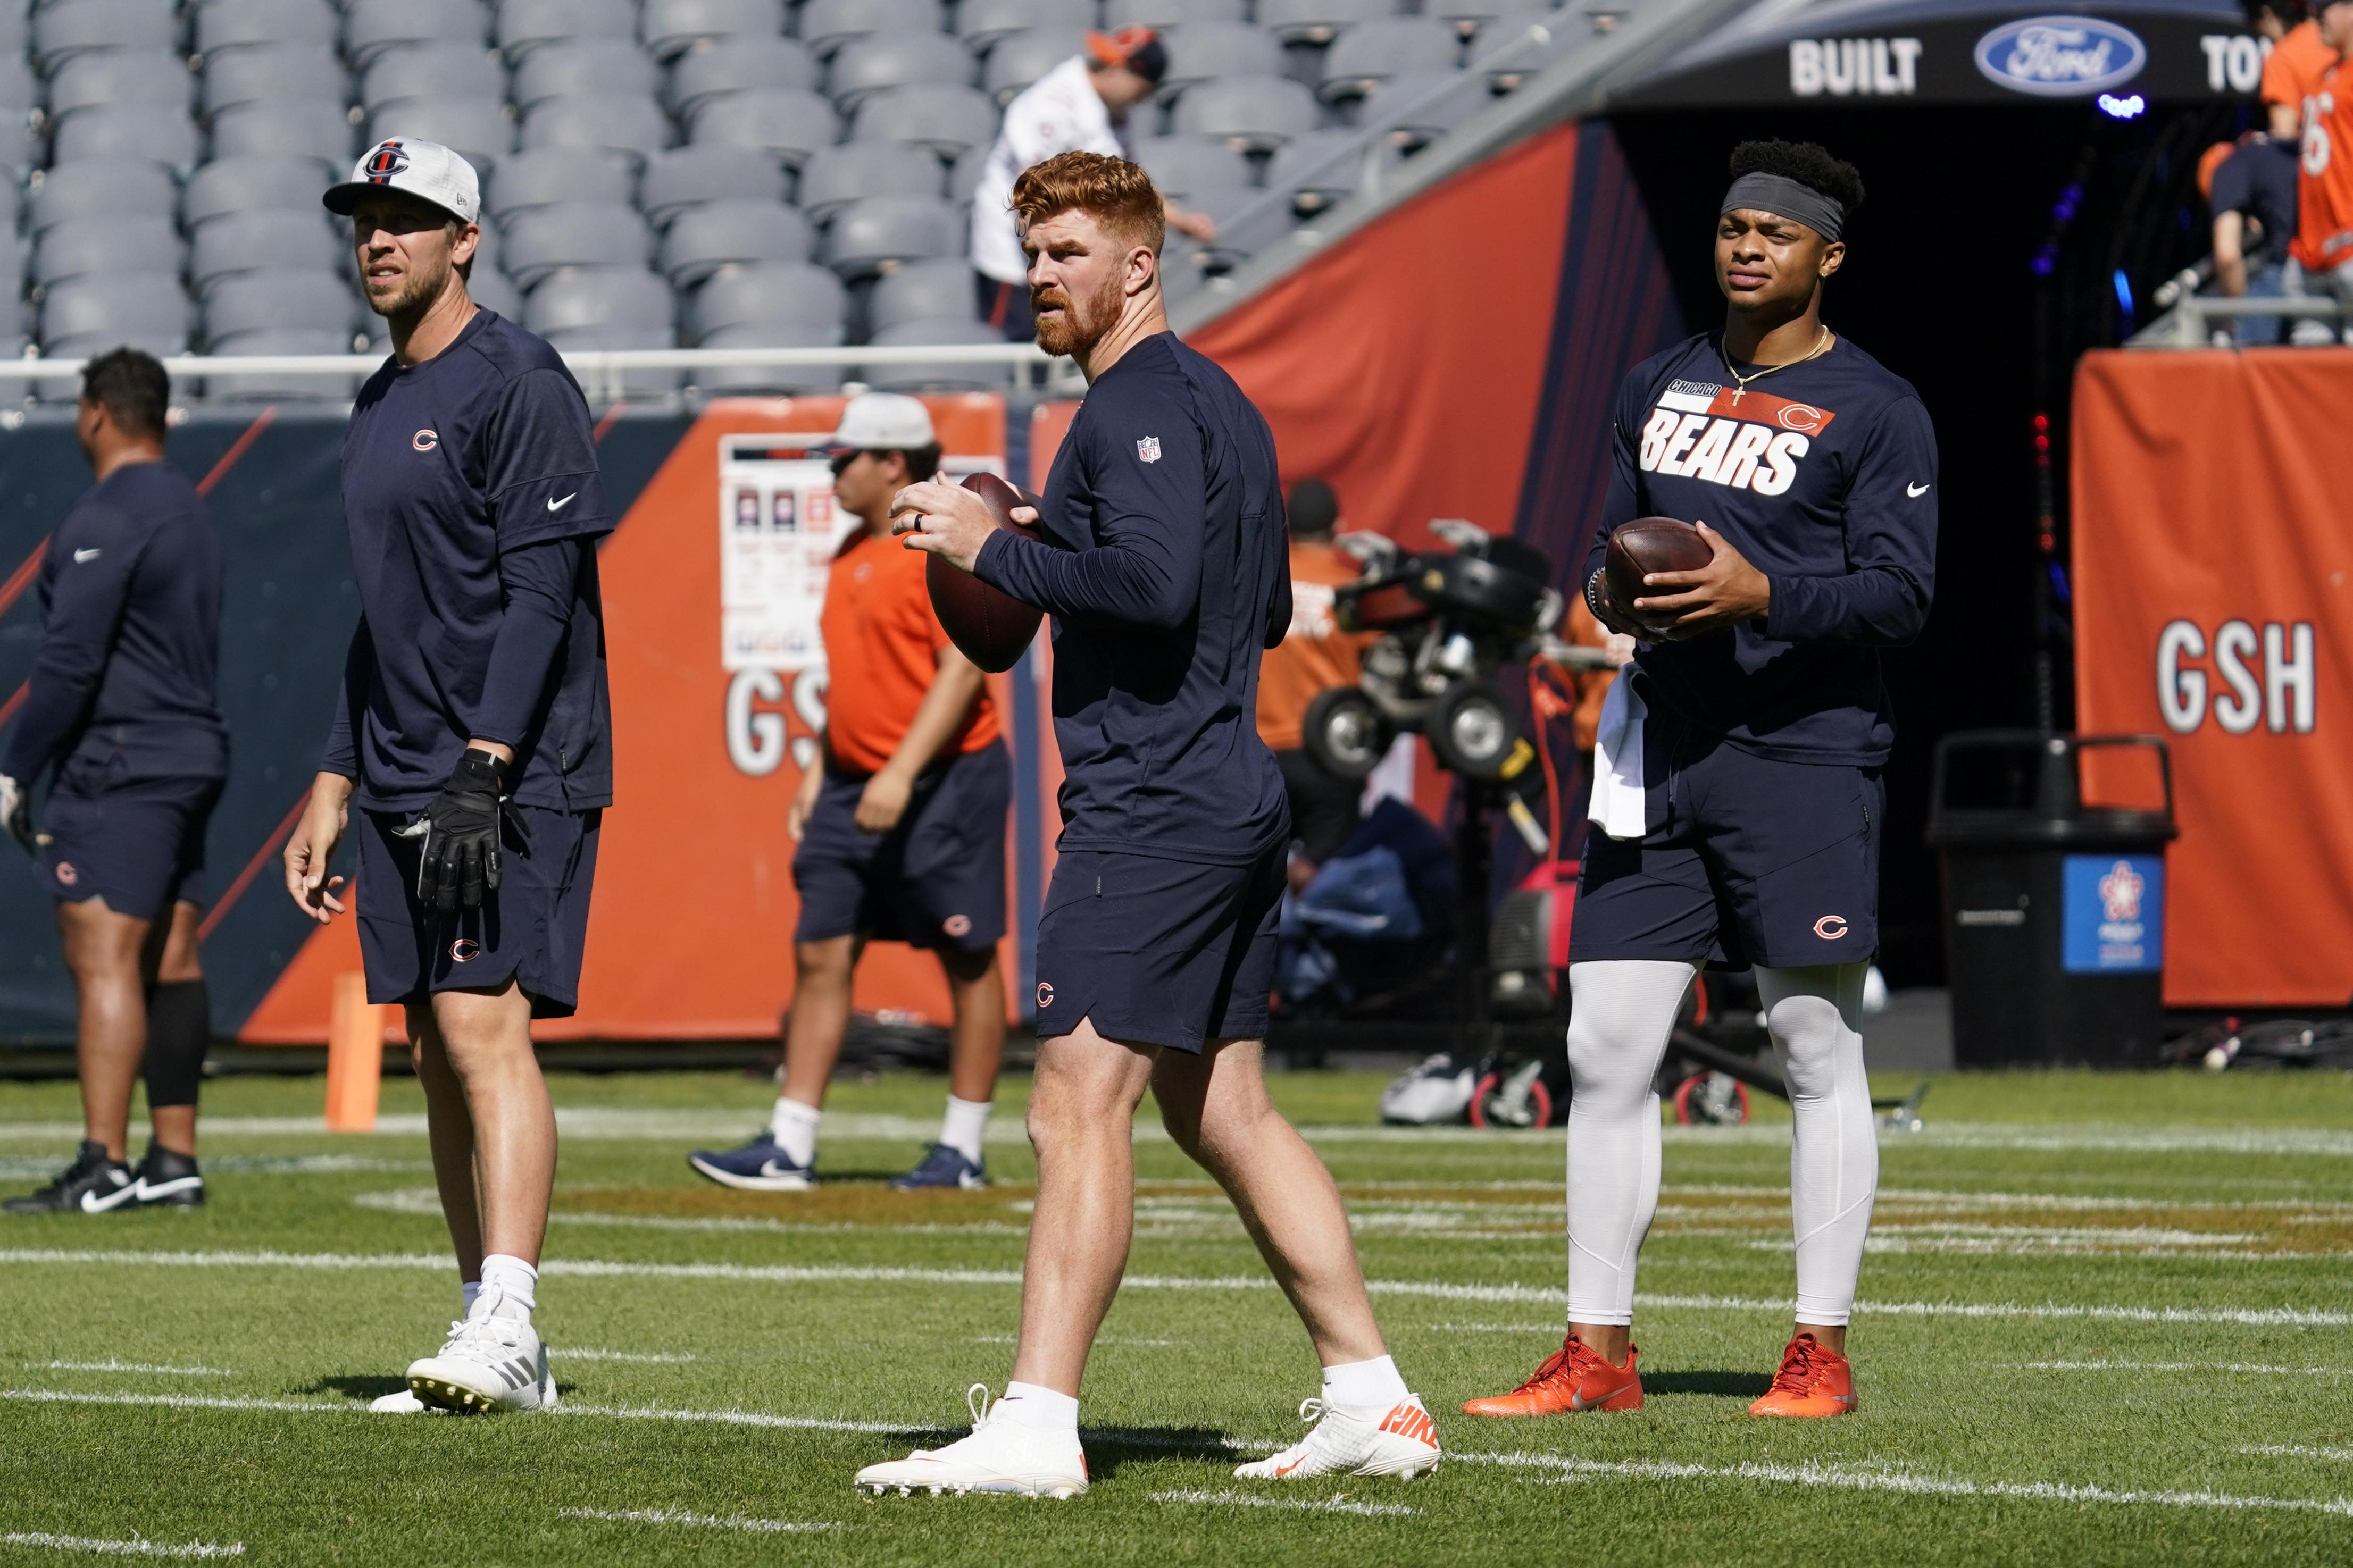 Bears quarterback Andy Dalton, center, looks to pass as fellow quarterbacks Nick Foles, left, and Justin Fields watch.